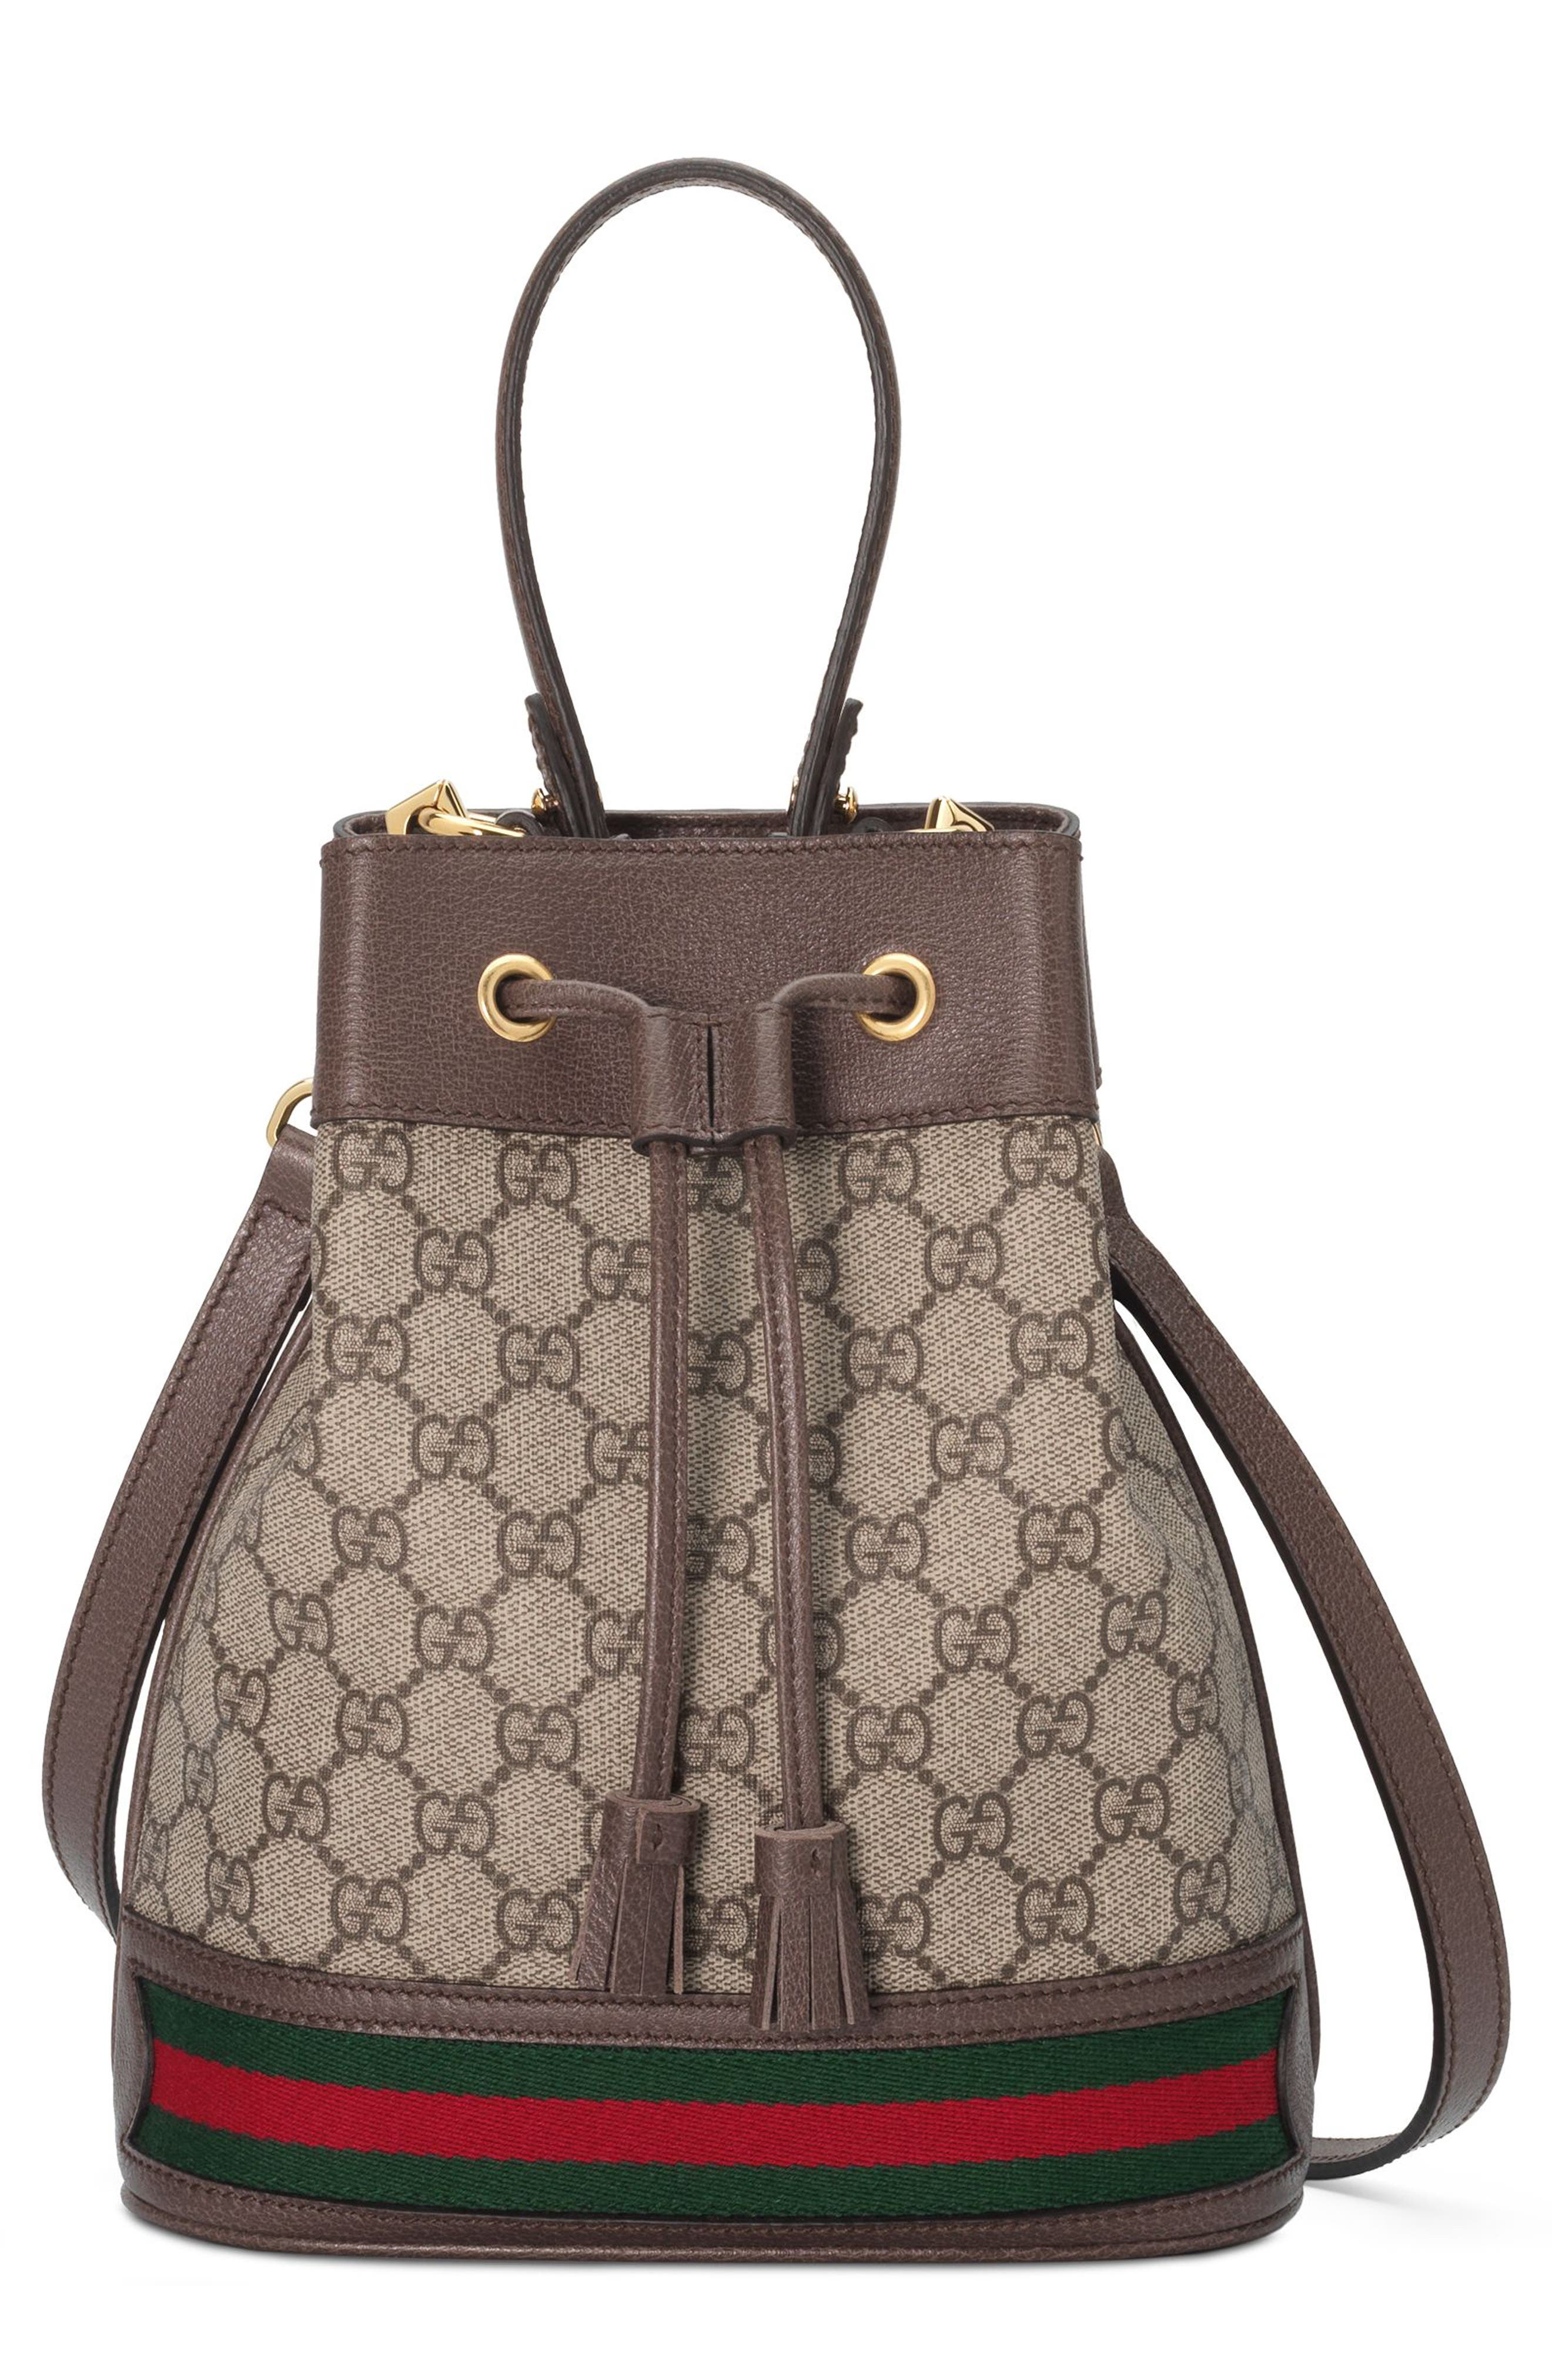 Small Ophidia GG Supreme Canvas Bucket Bag,                         Main,                         color, BEIGE EBONY/ NEW ACERO